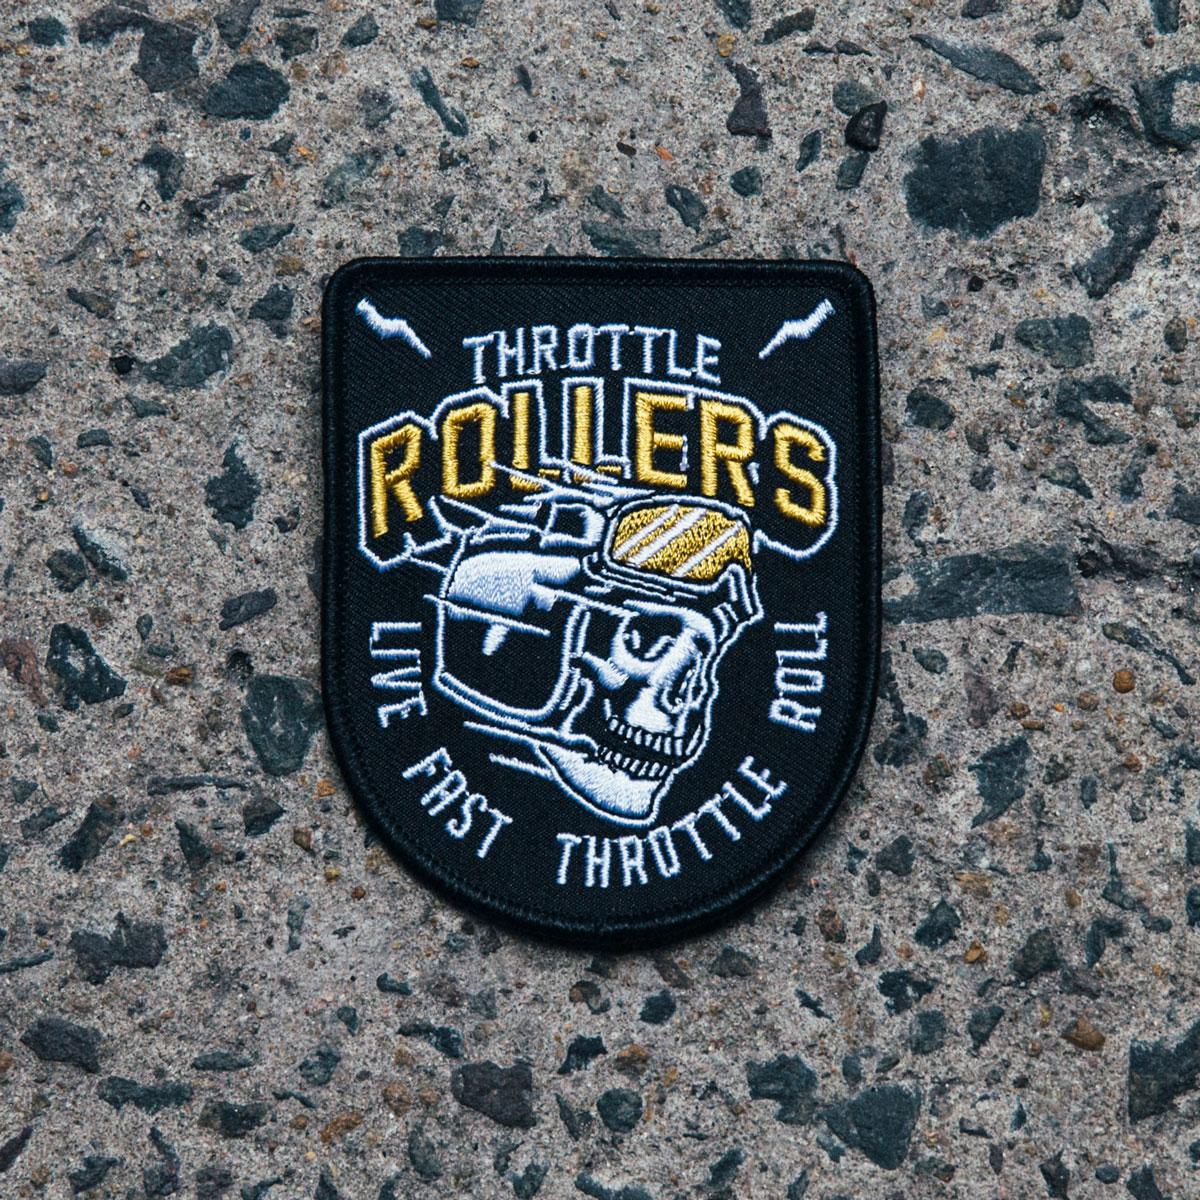 Throttle_Roll_Merch_2017_4190